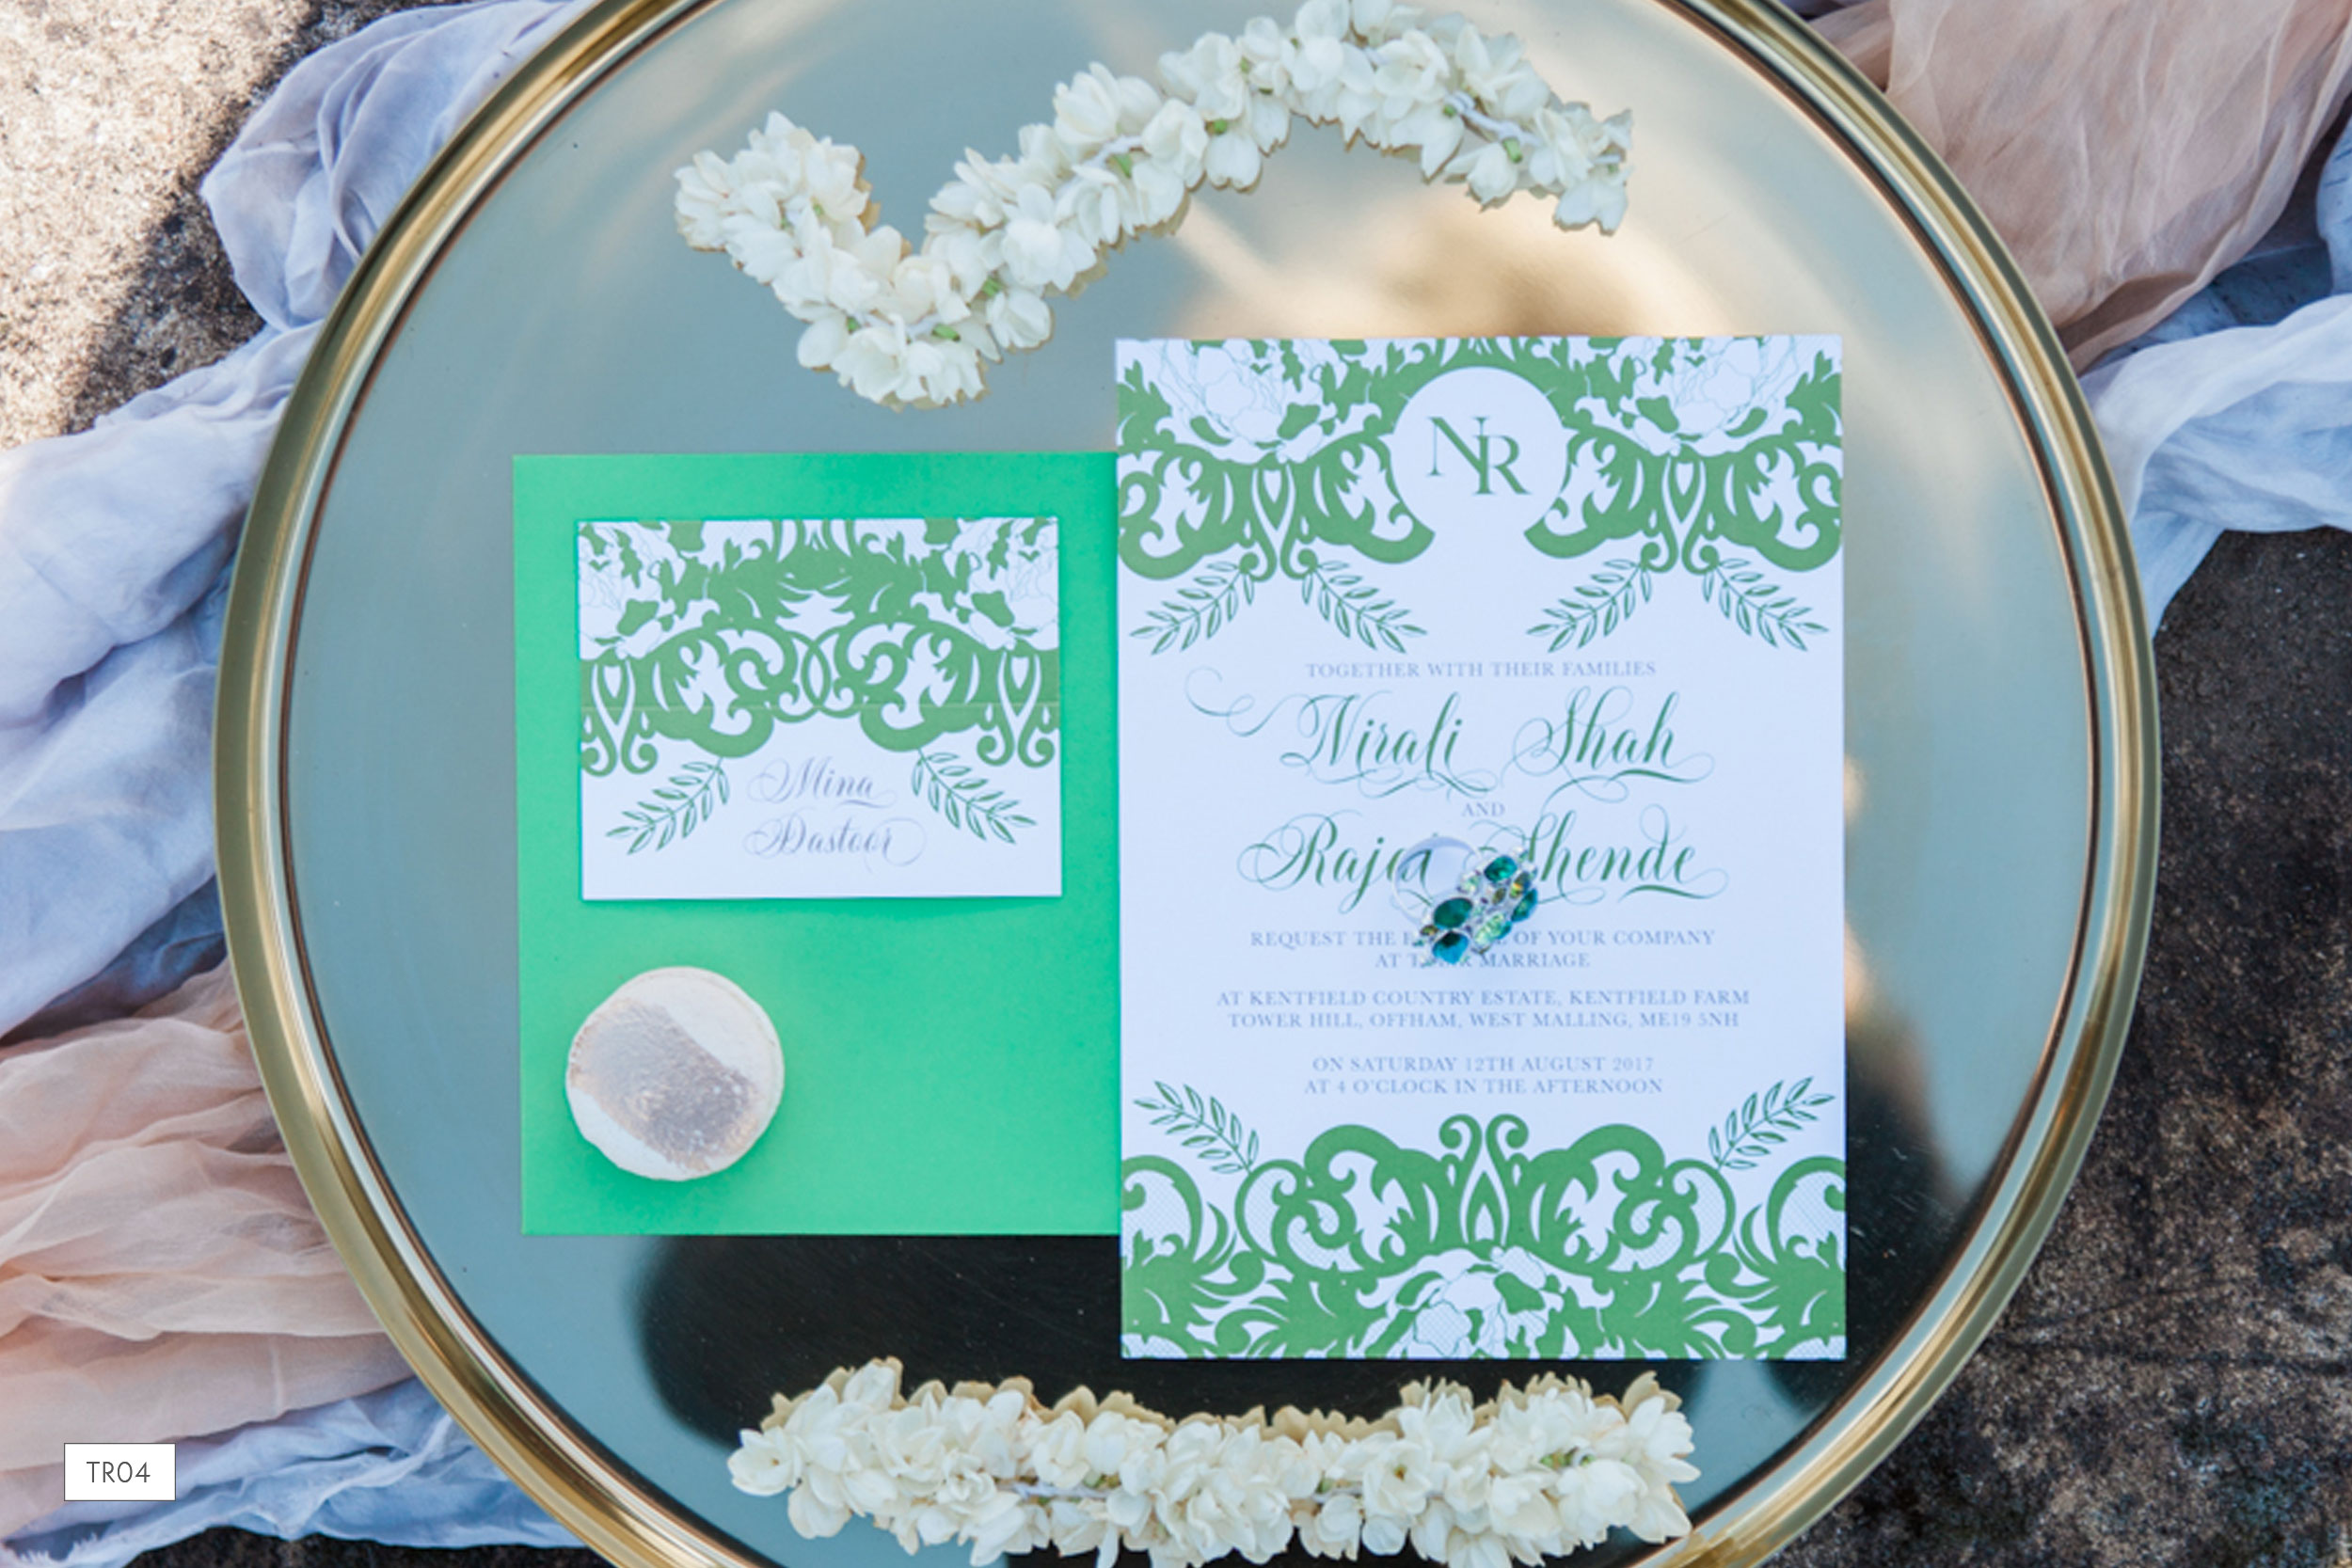 pantone-greenery-wedding-invitation-set.jpg